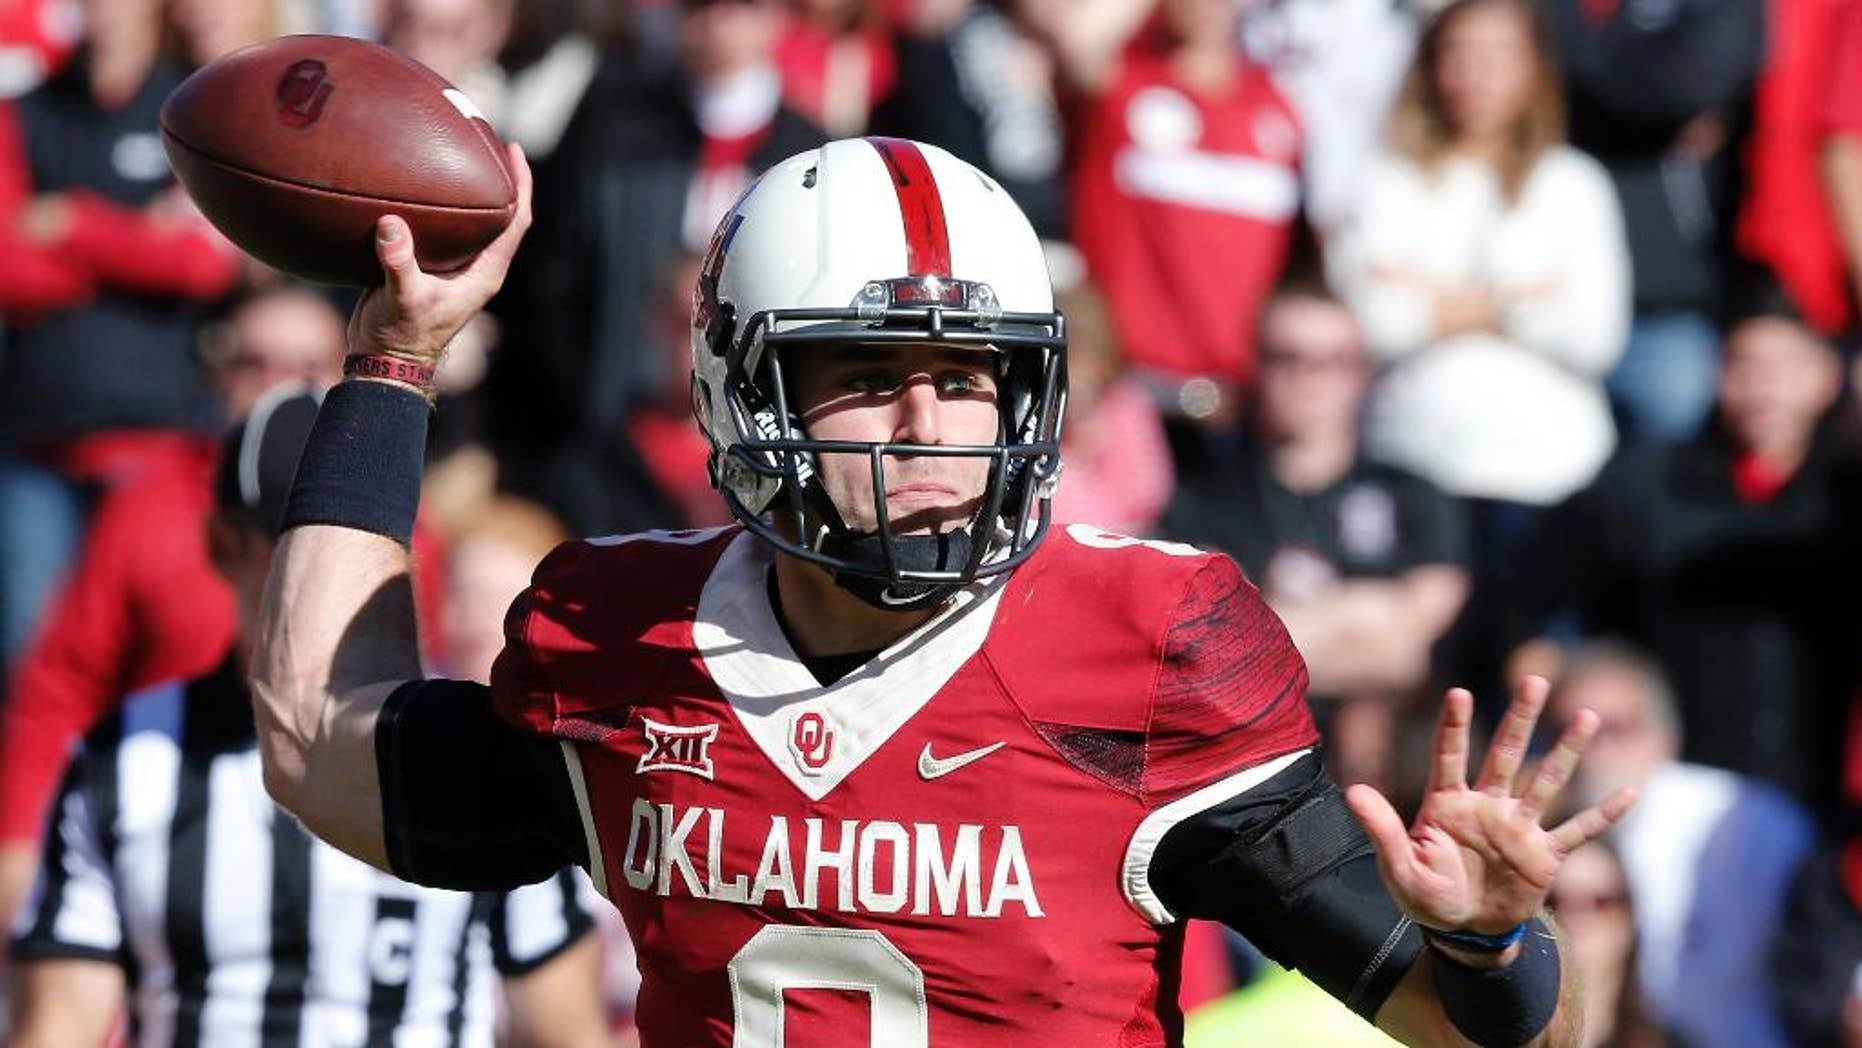 Oklahoma quarterback Trevor Knight (9) passes in the third quarter of an NCAA college football game against Baylor in Norman, Okla., Saturday, Nov. 8, 2014. Baylor won 48-14. (AP Photo/Sue Ogrocki)